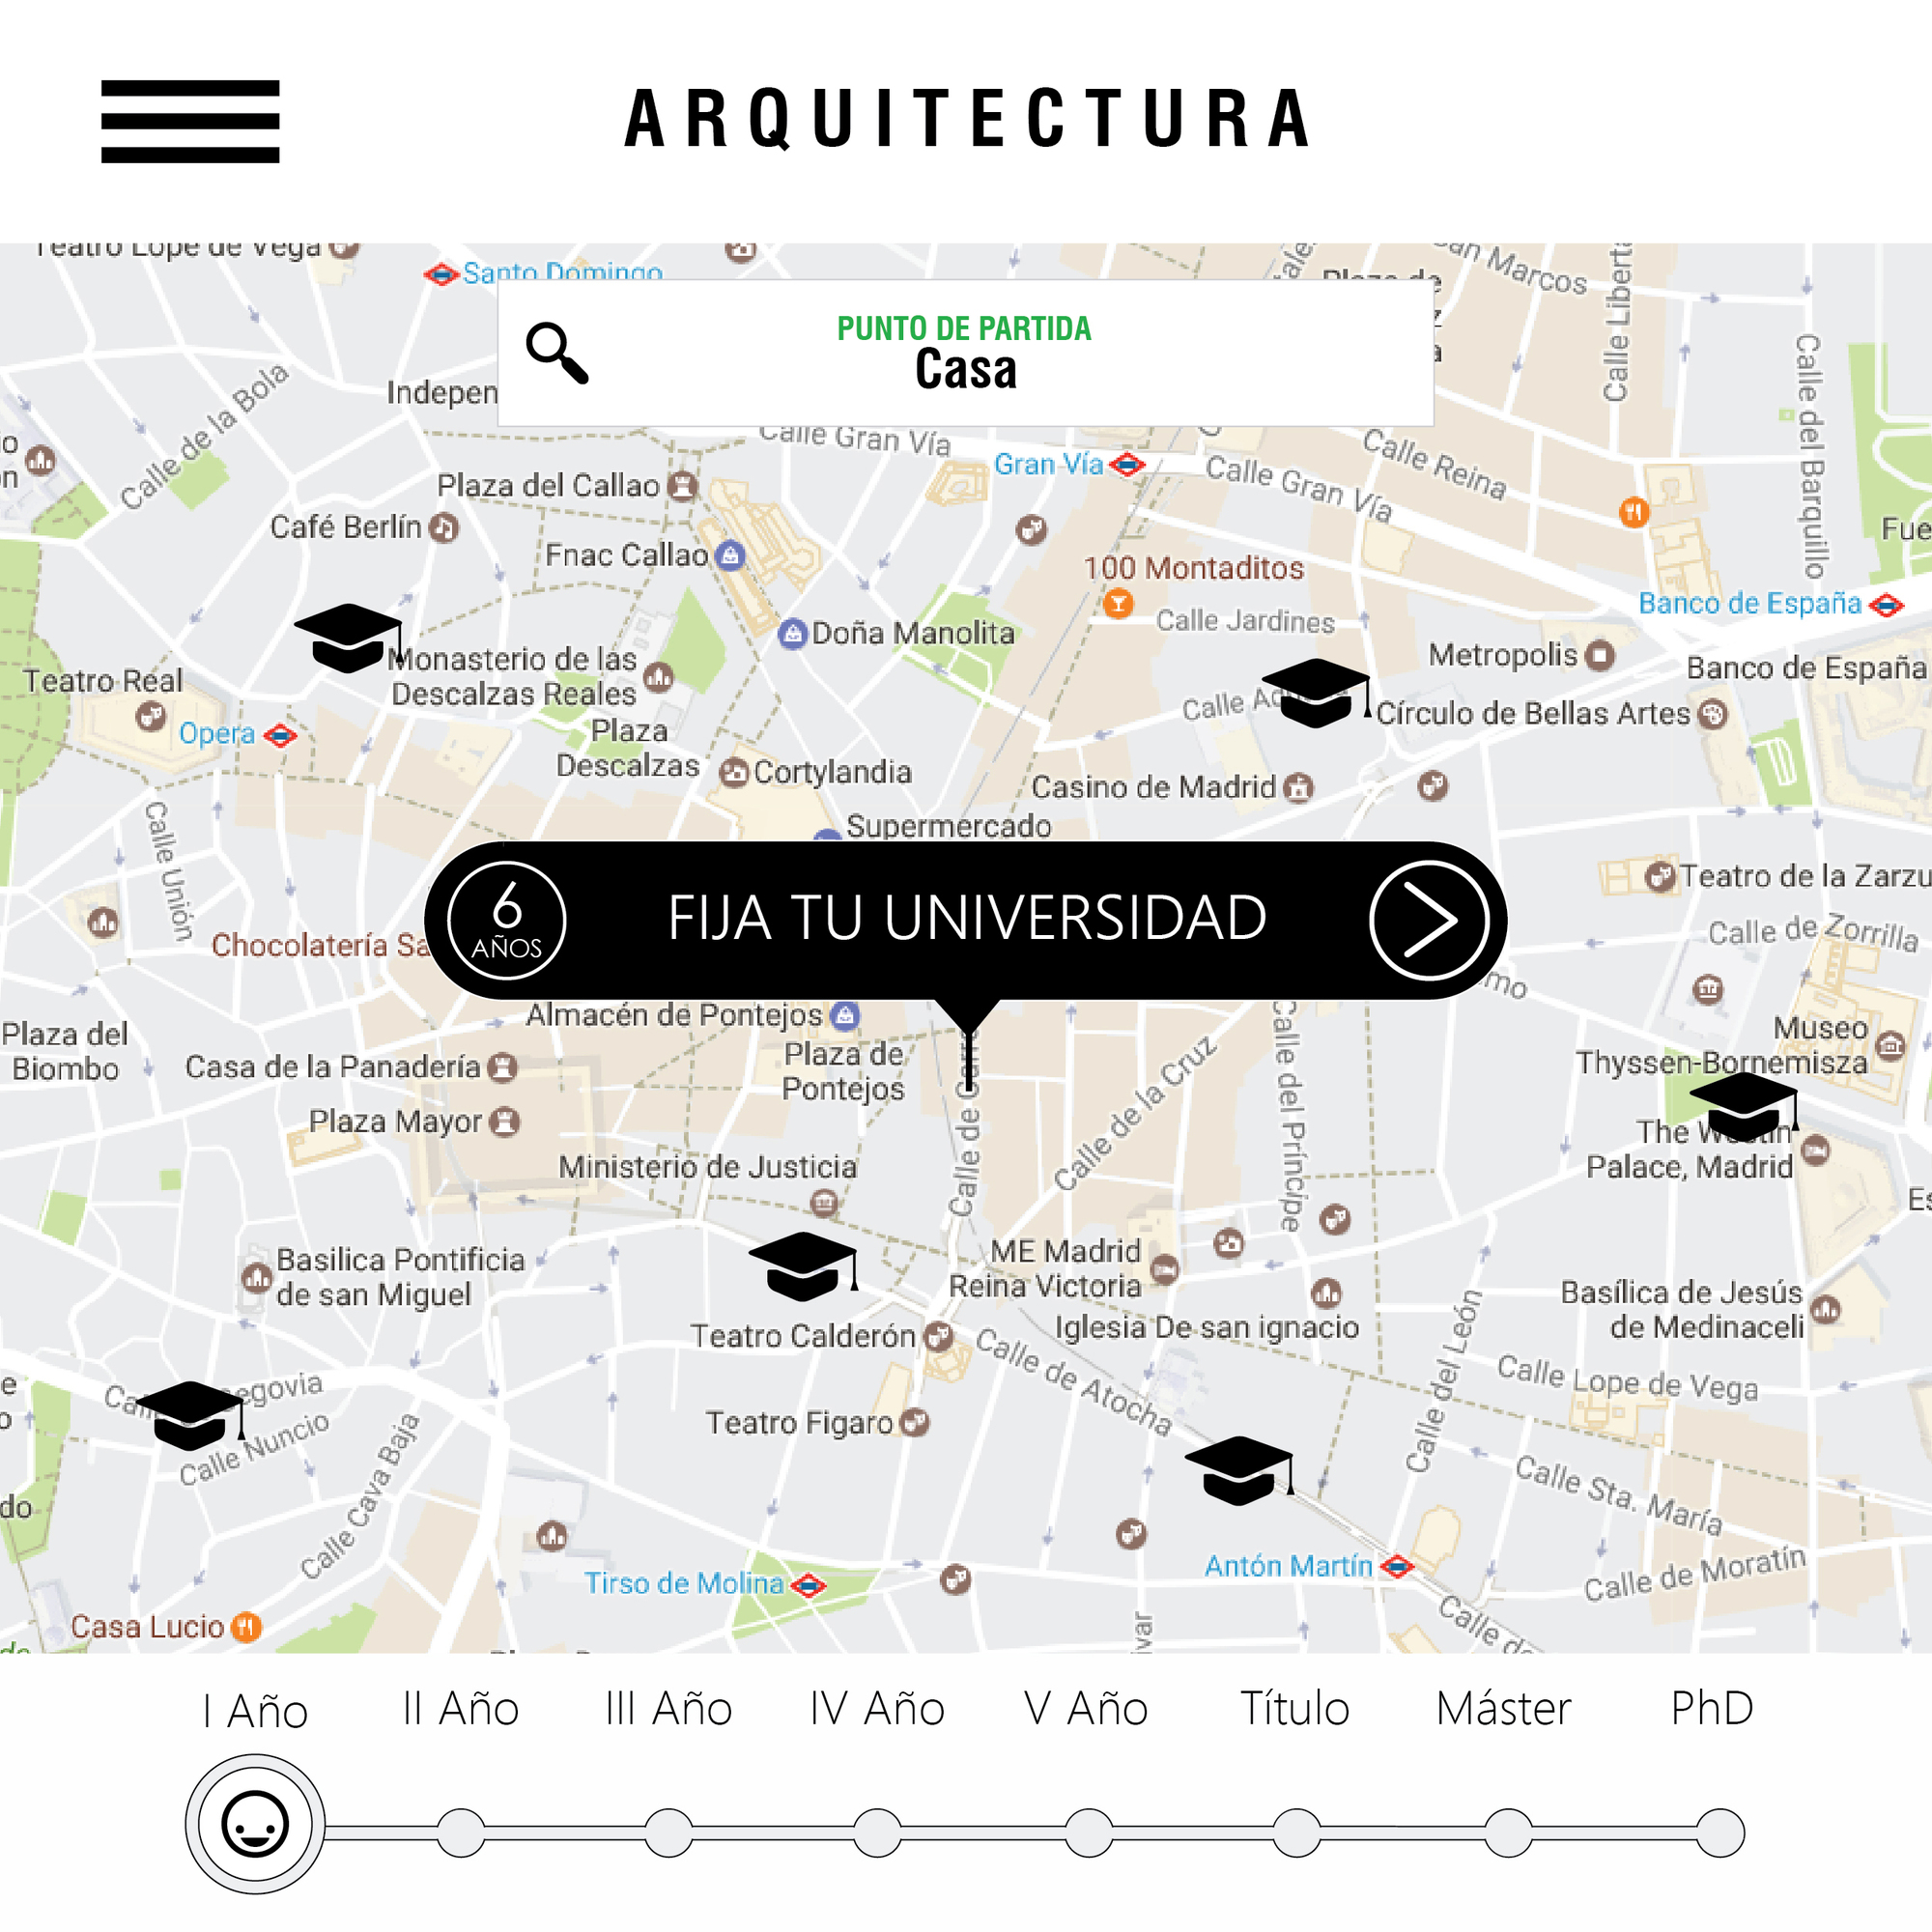 Estudiar Arquitectura no es ni Uber ni Netflix